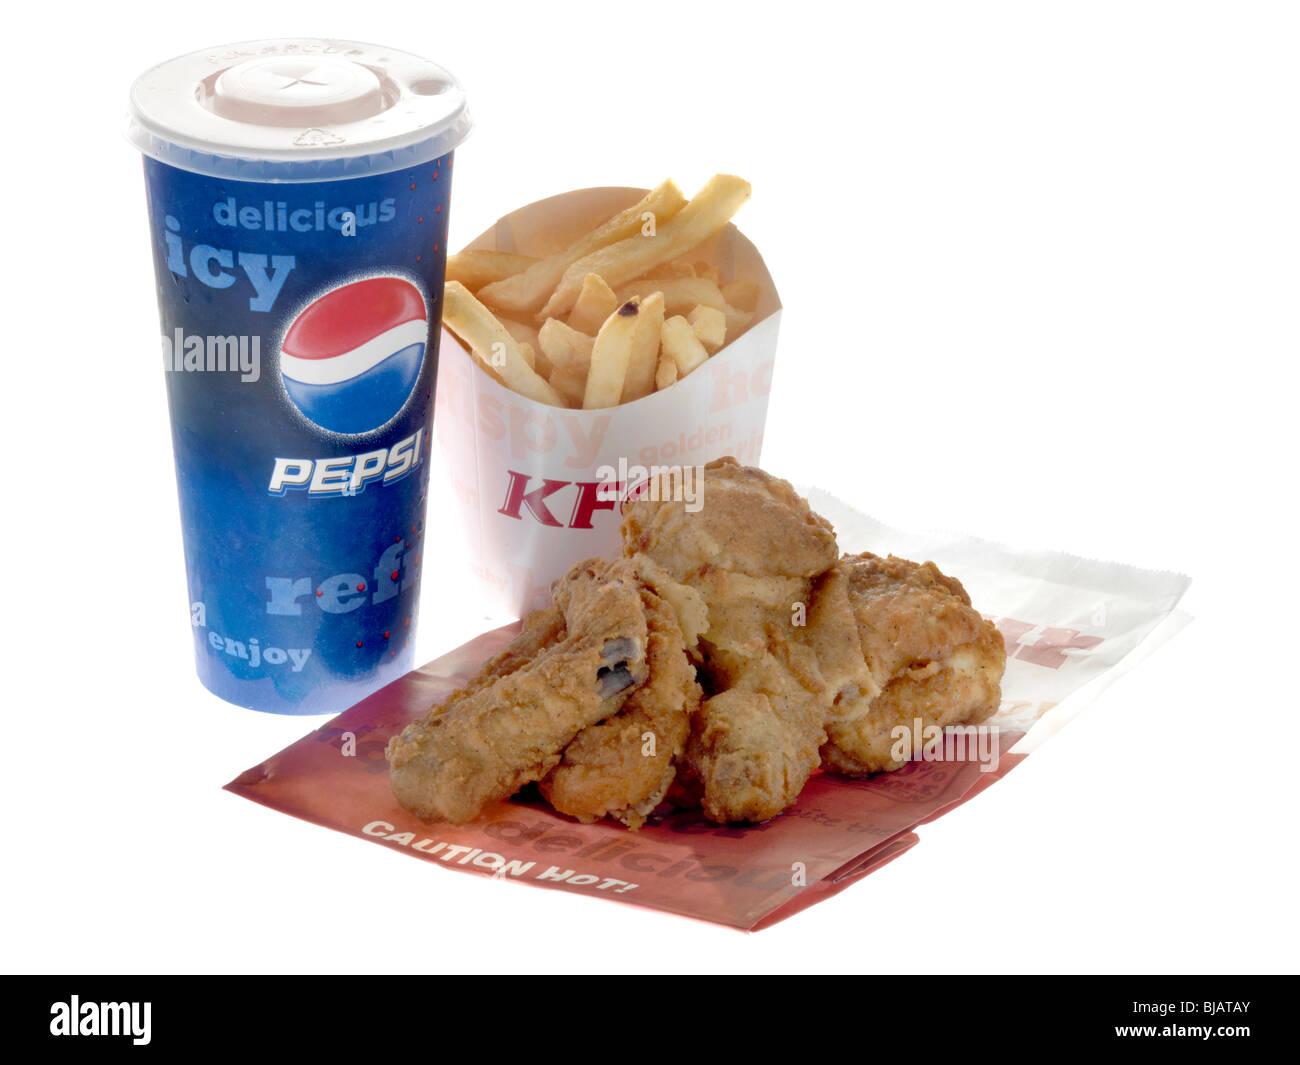 Original Recipe Fried Chicken Meal - Stock Image